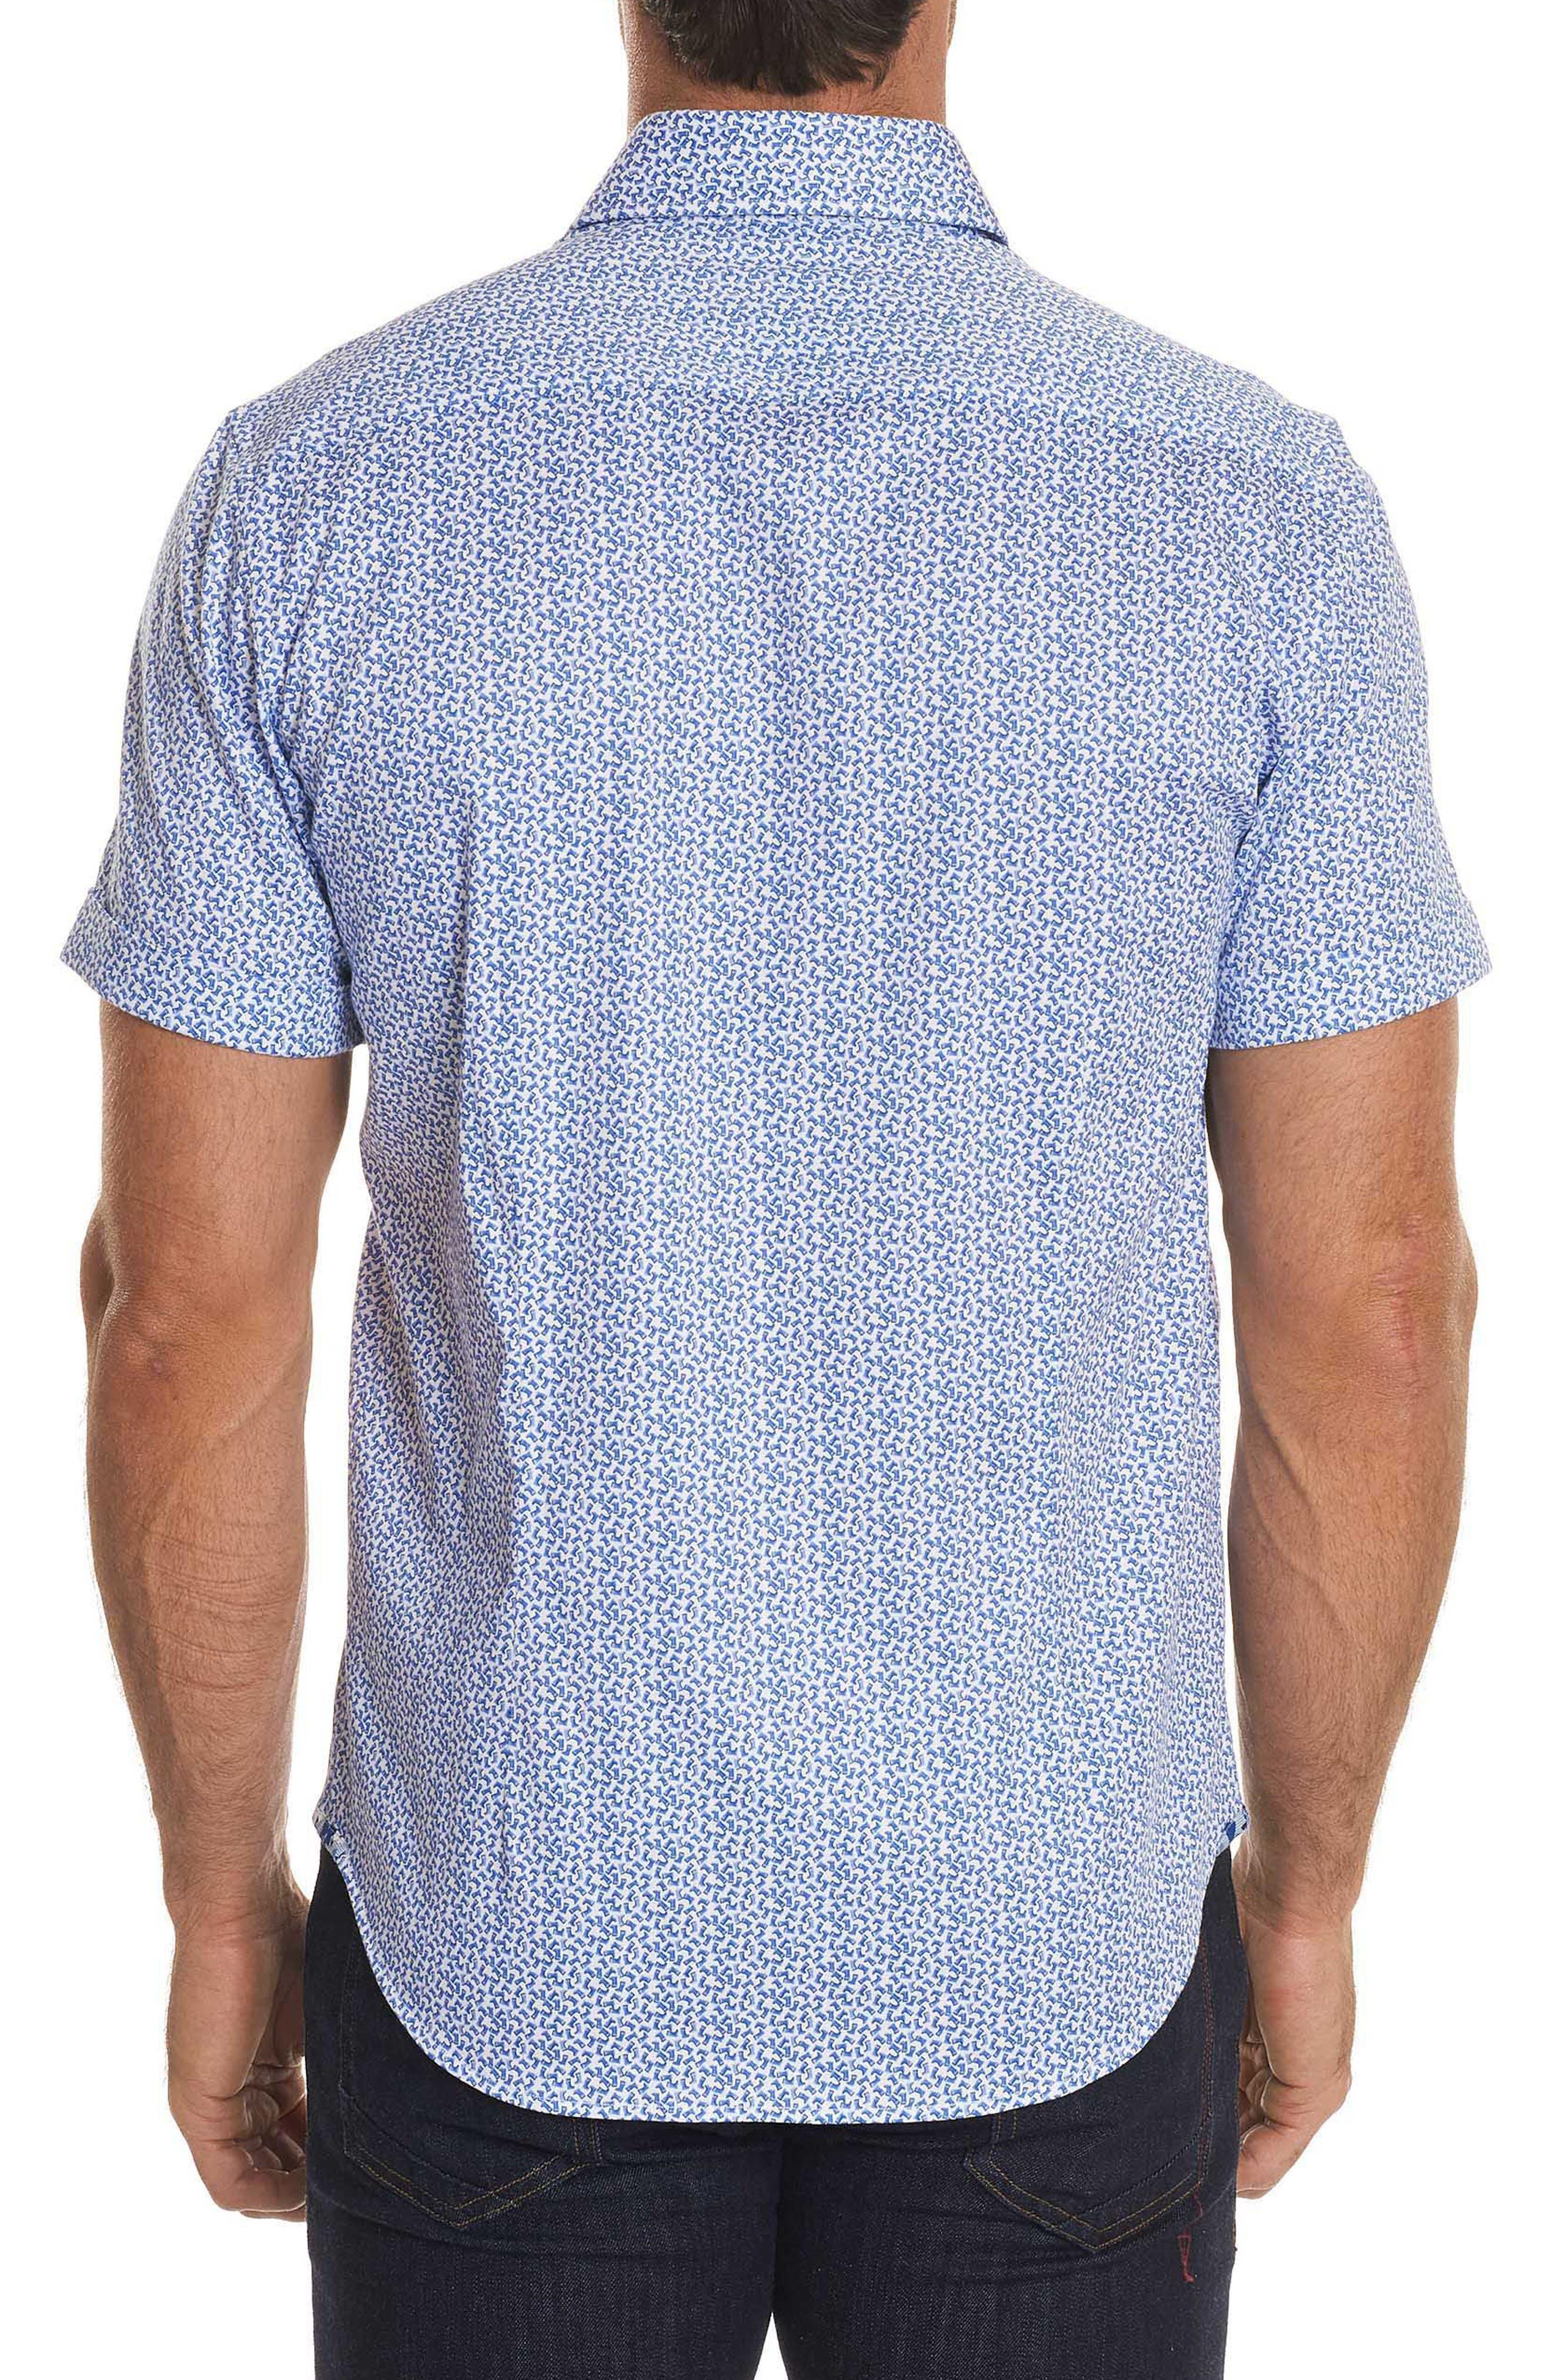 Hartman Tailored Fit Sport Shirt,                             Alternate thumbnail 2, color,